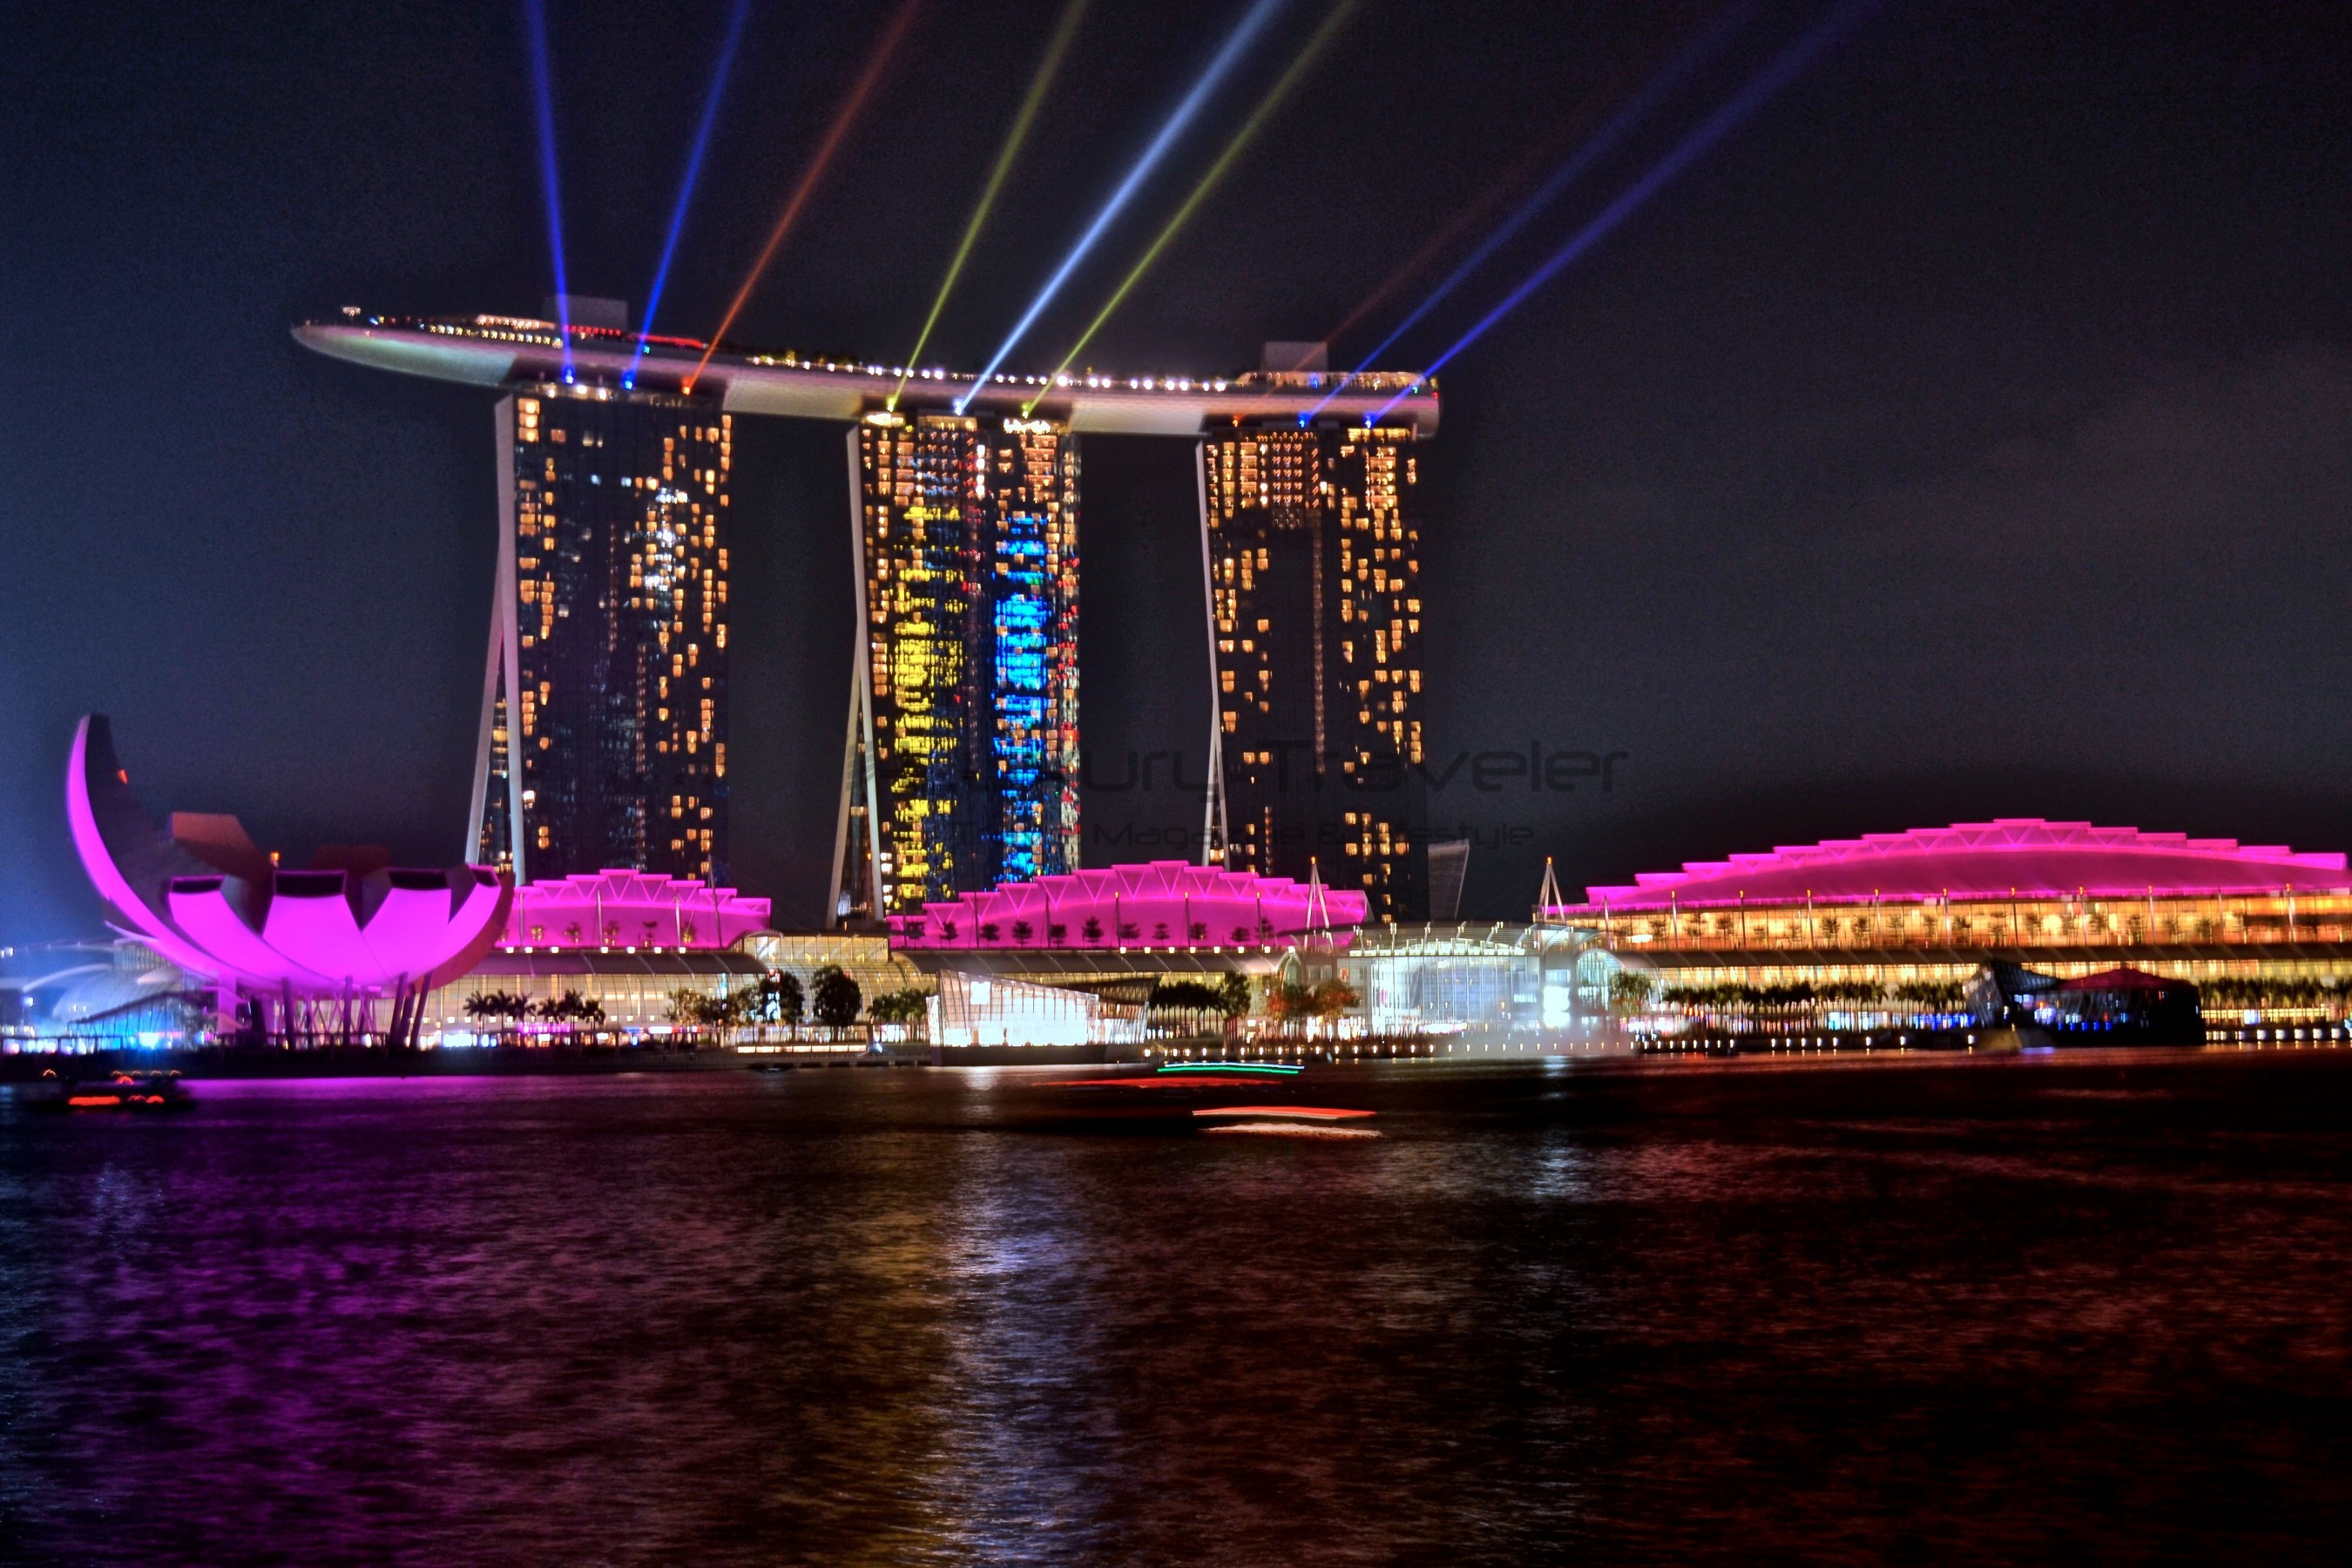 Marina Bay Sands Singapore Outstanding Luxury Hotel